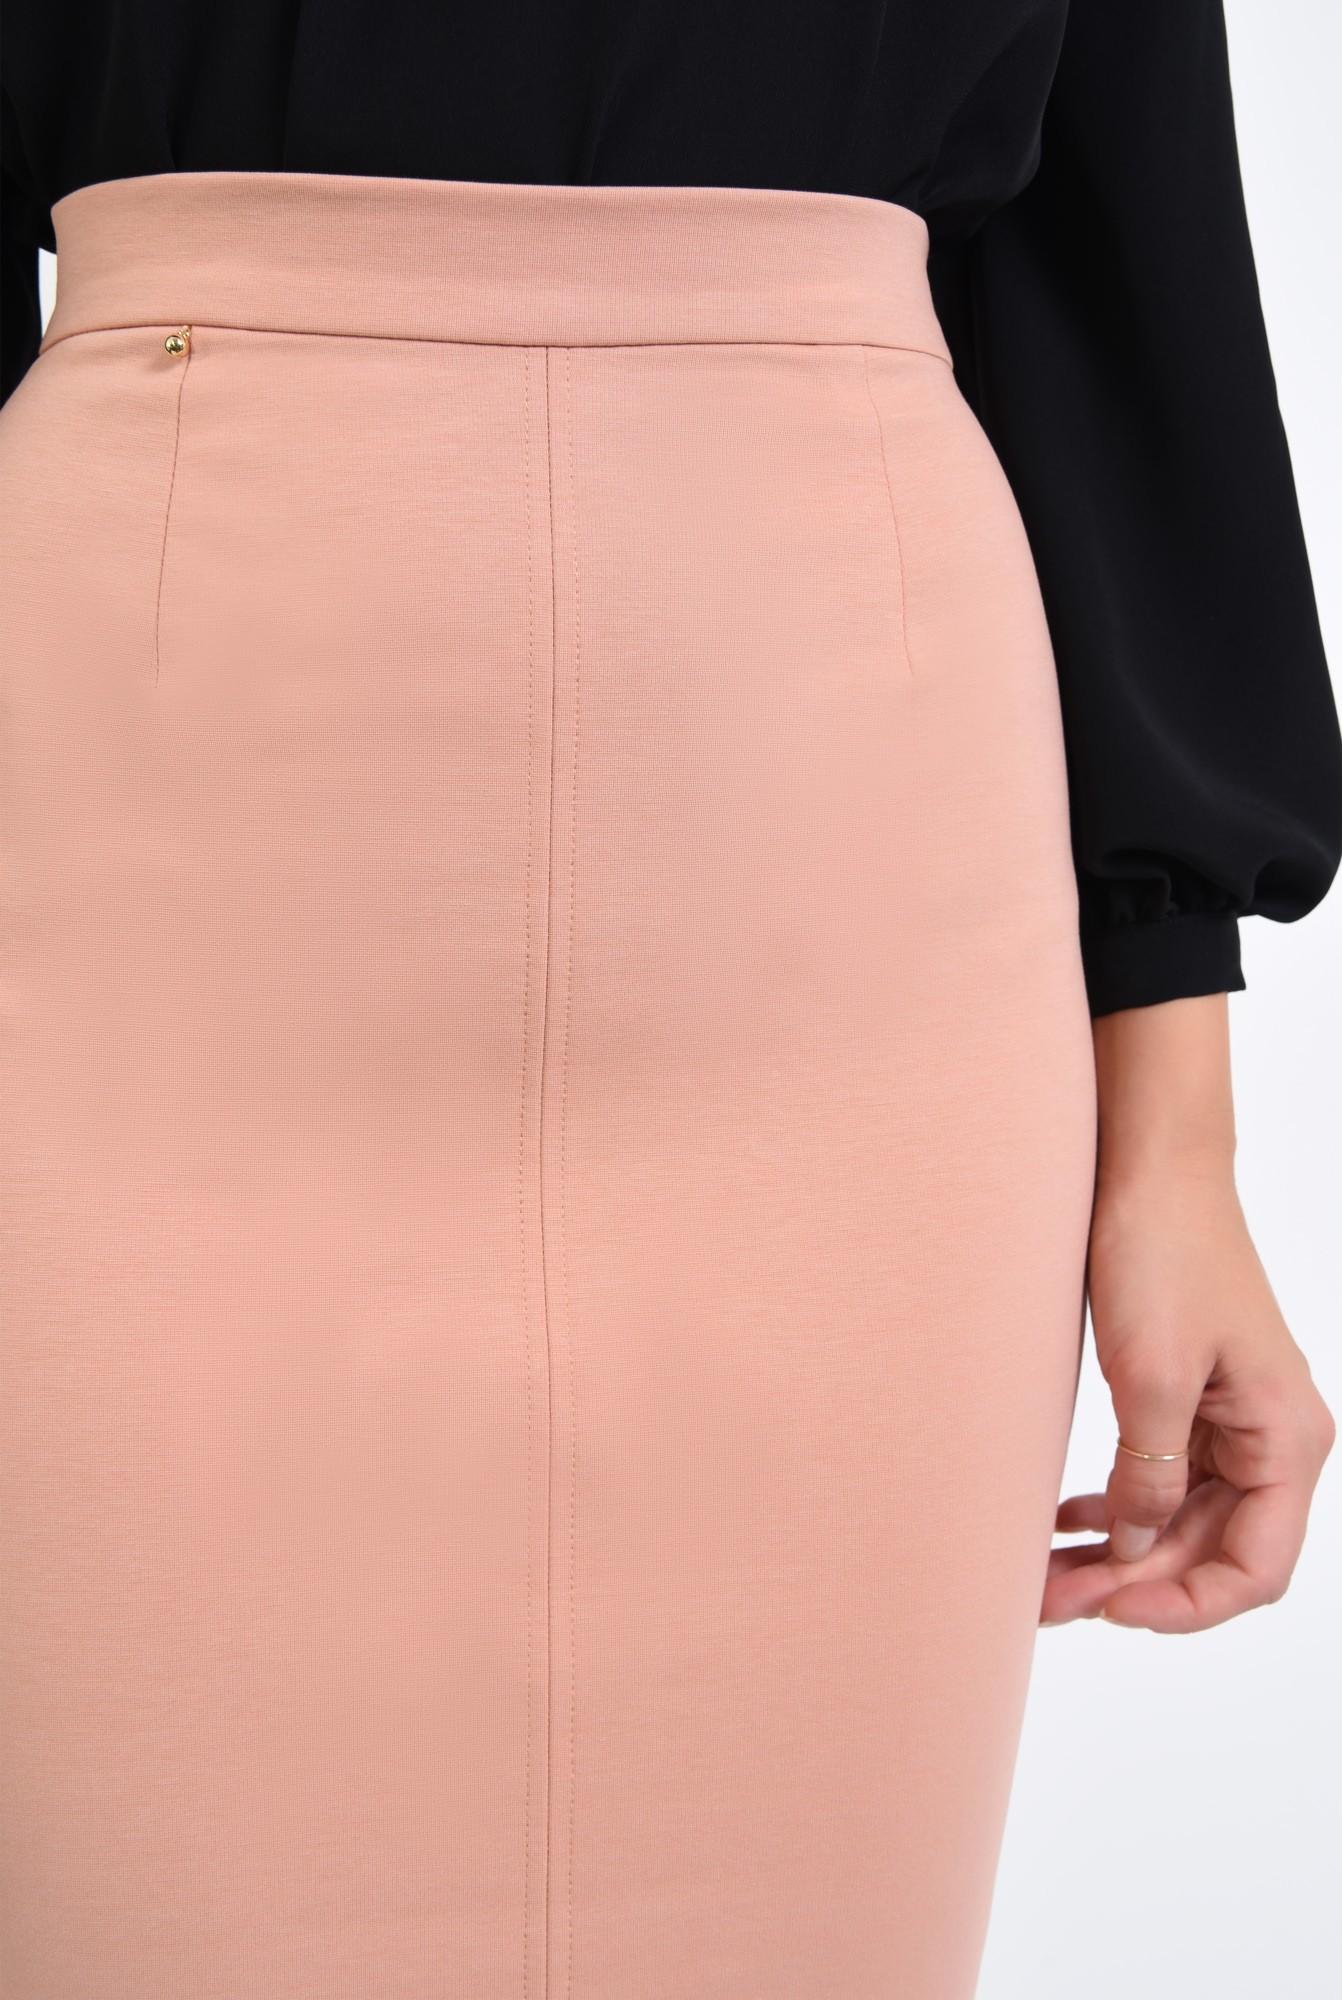 2 - fusta casual, roz piersica, croi conic, talie inalta